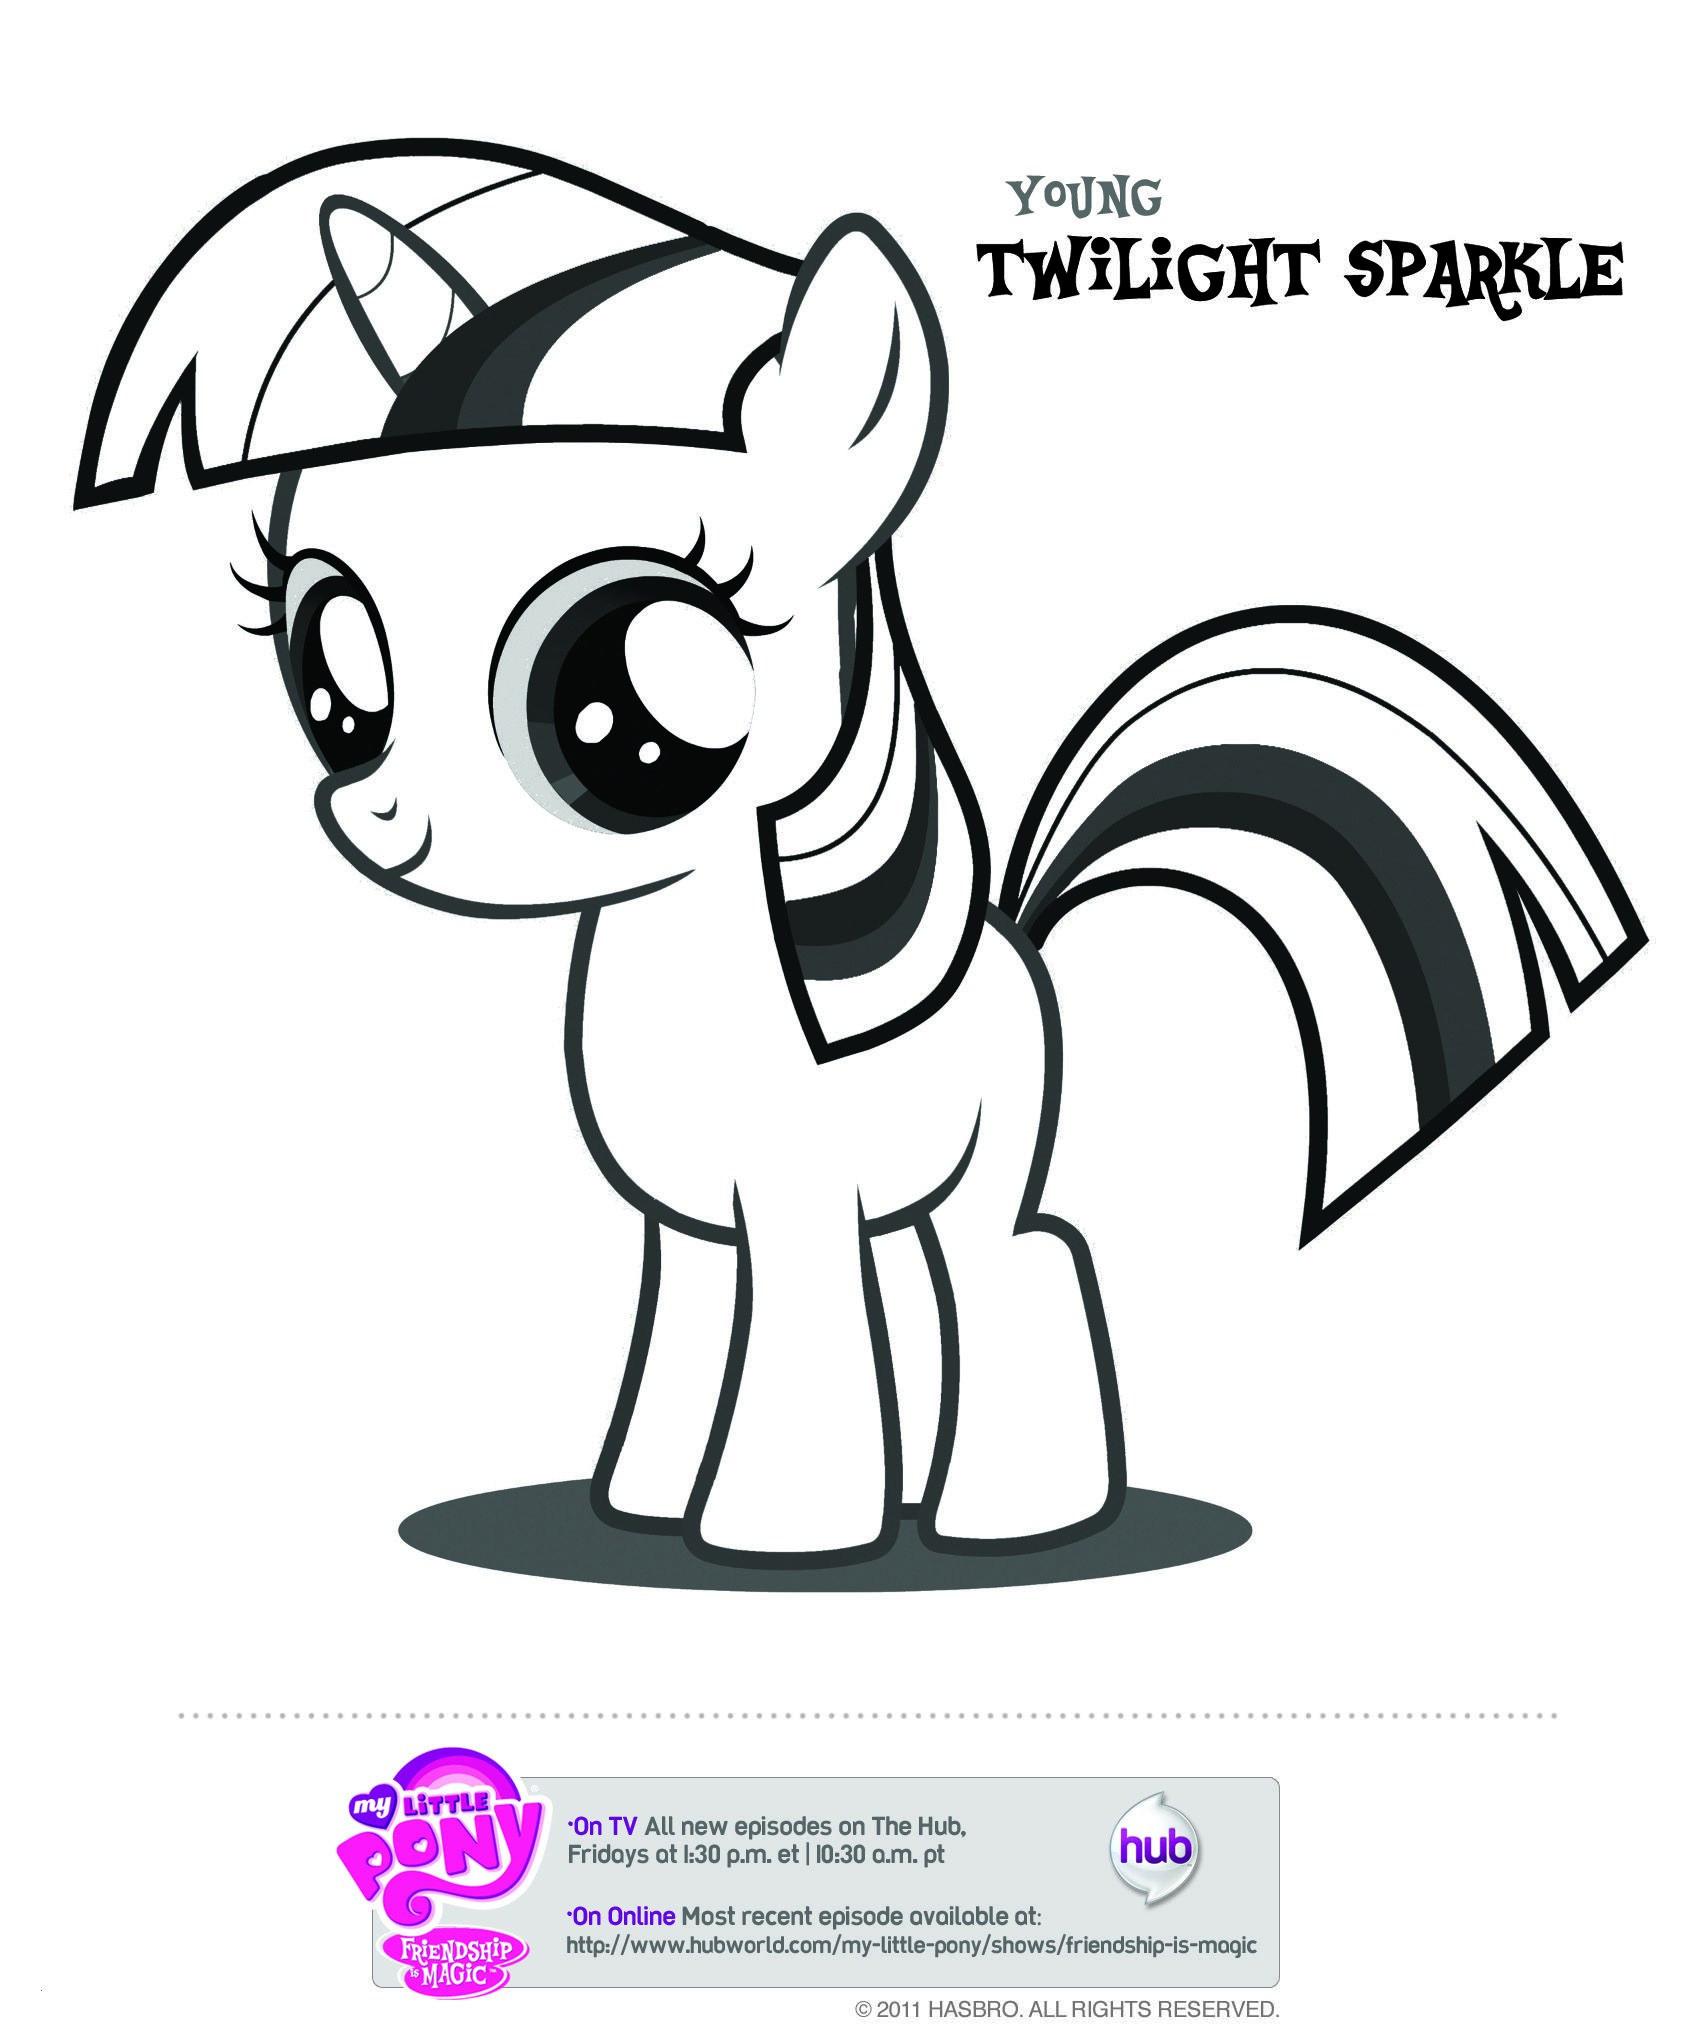 My Little Pony Friendship is Magic Ausmalbilder Das Beste Von 40 My Little Pony Friendship is Magic Ausmalbilder Scoredatscore Fotografieren